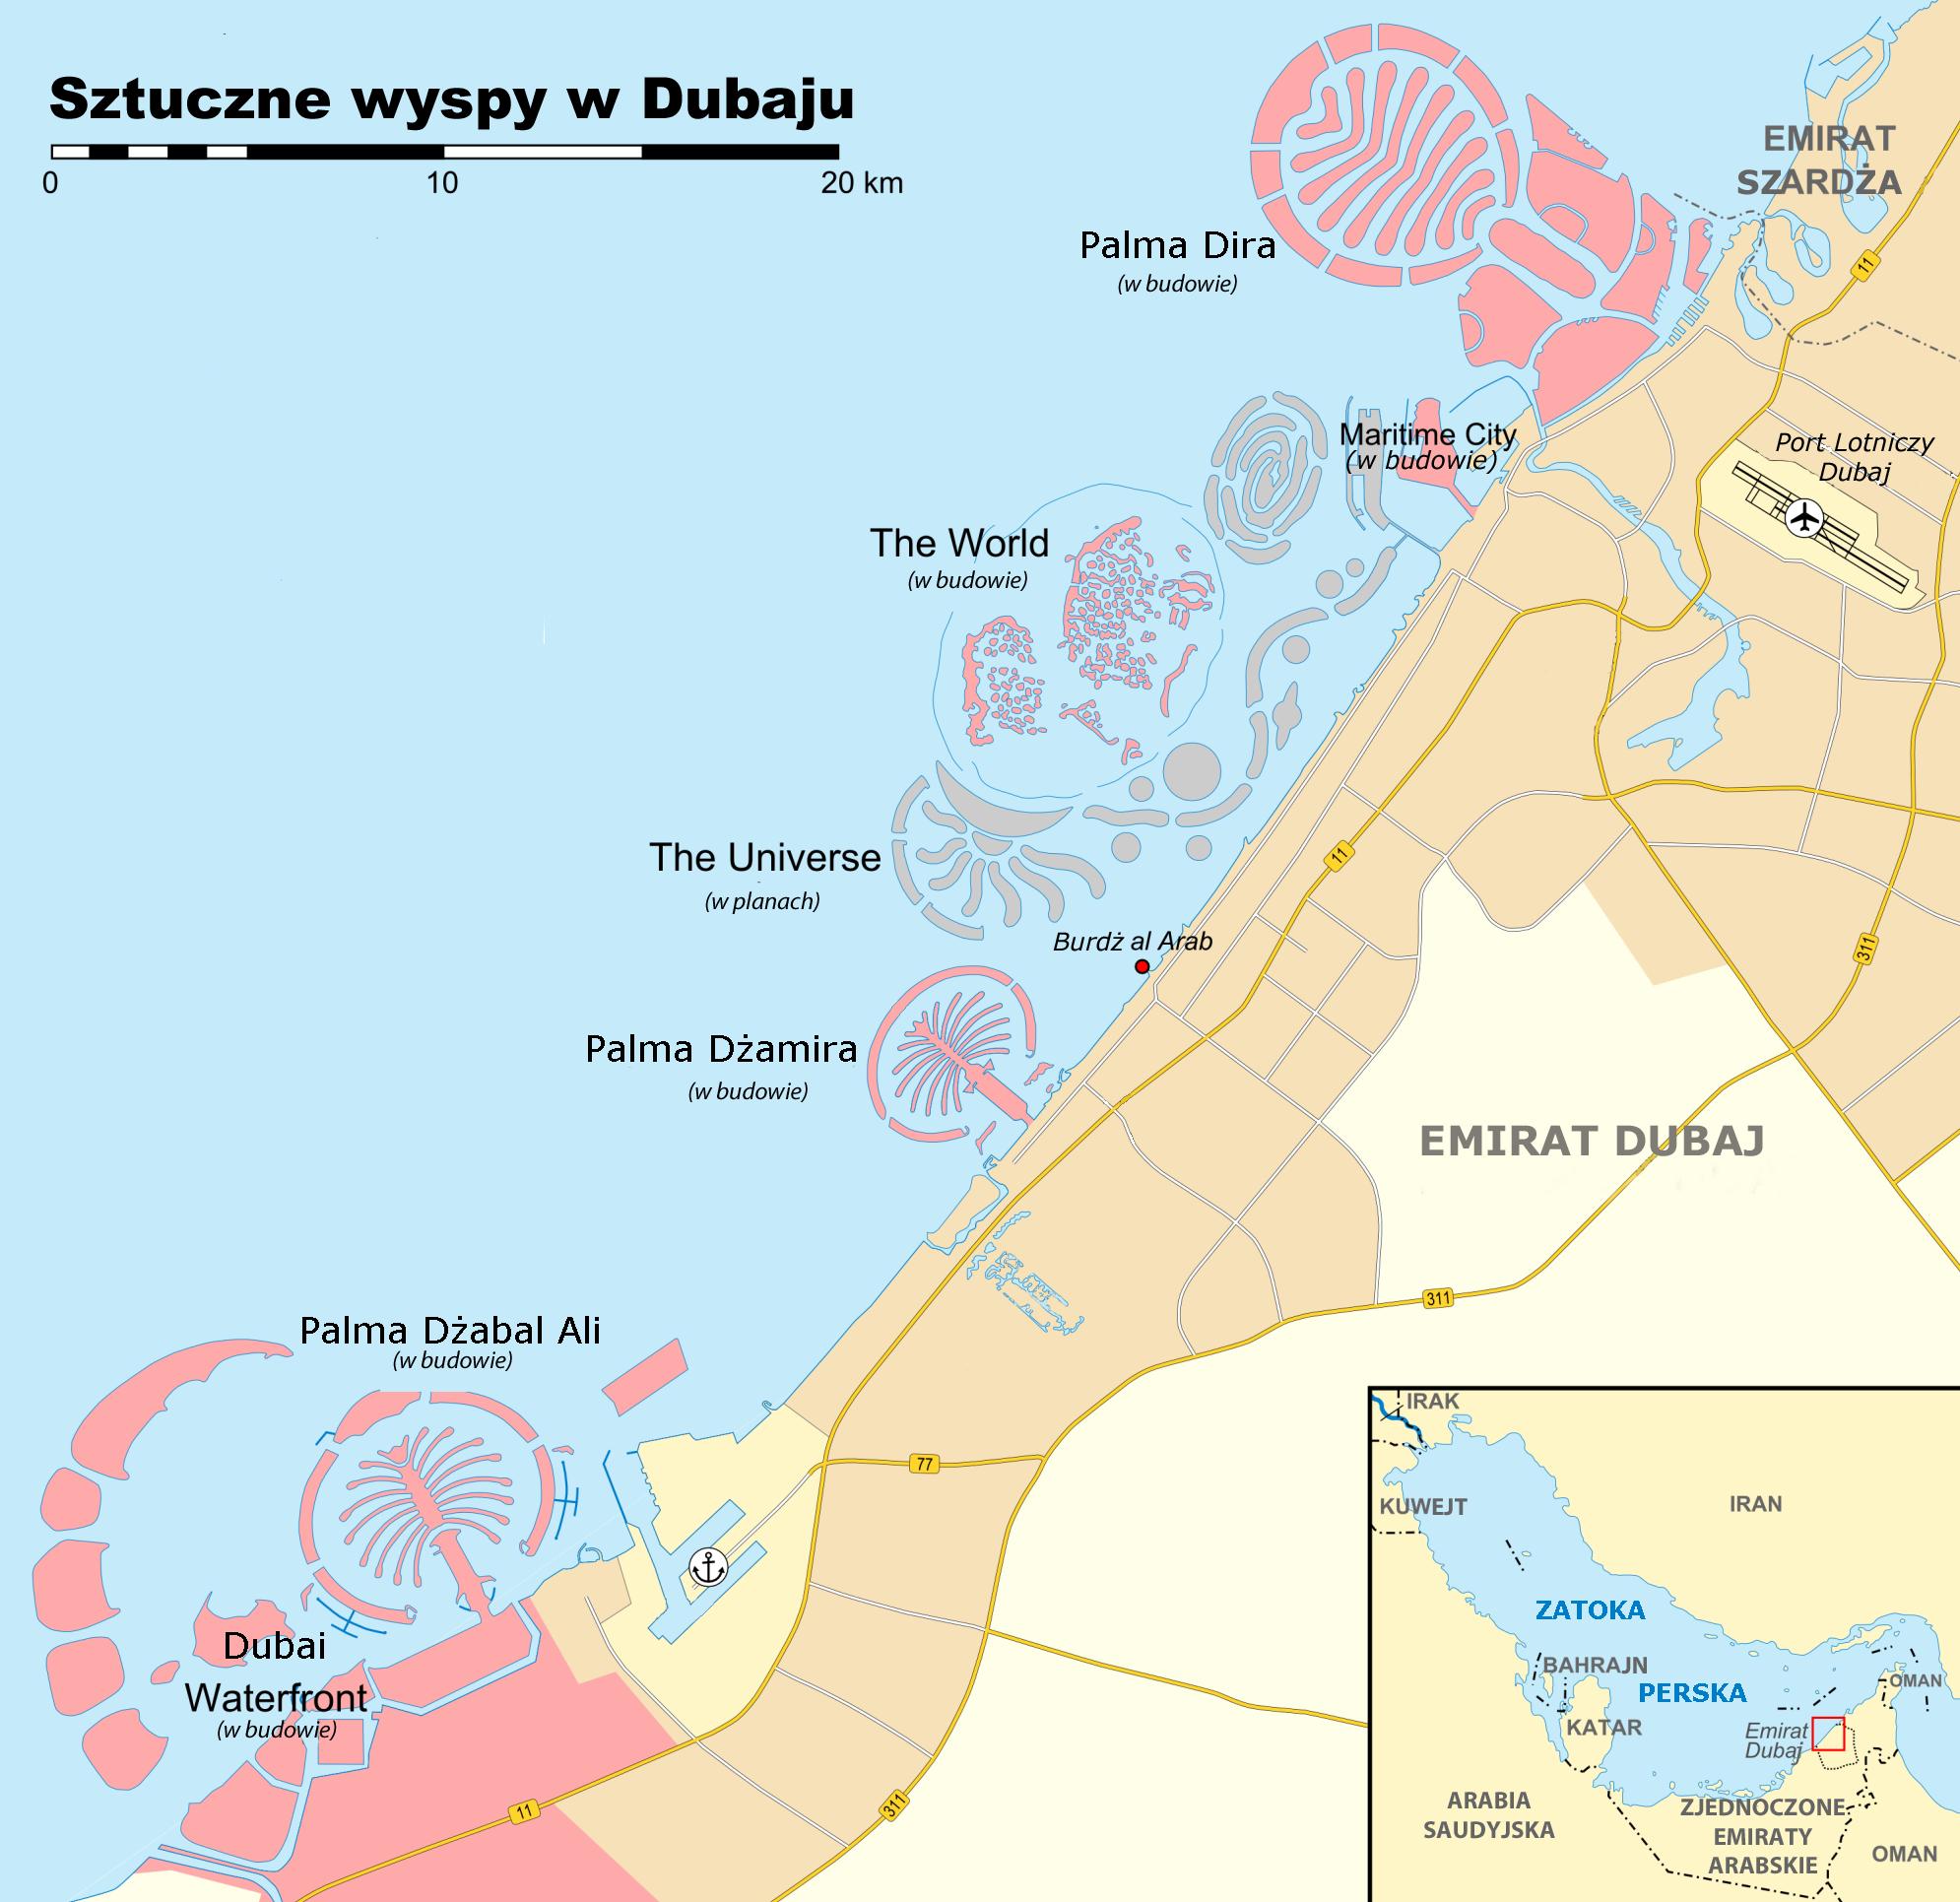 Дубай карта с космоса бизнес недвижимости в дубае